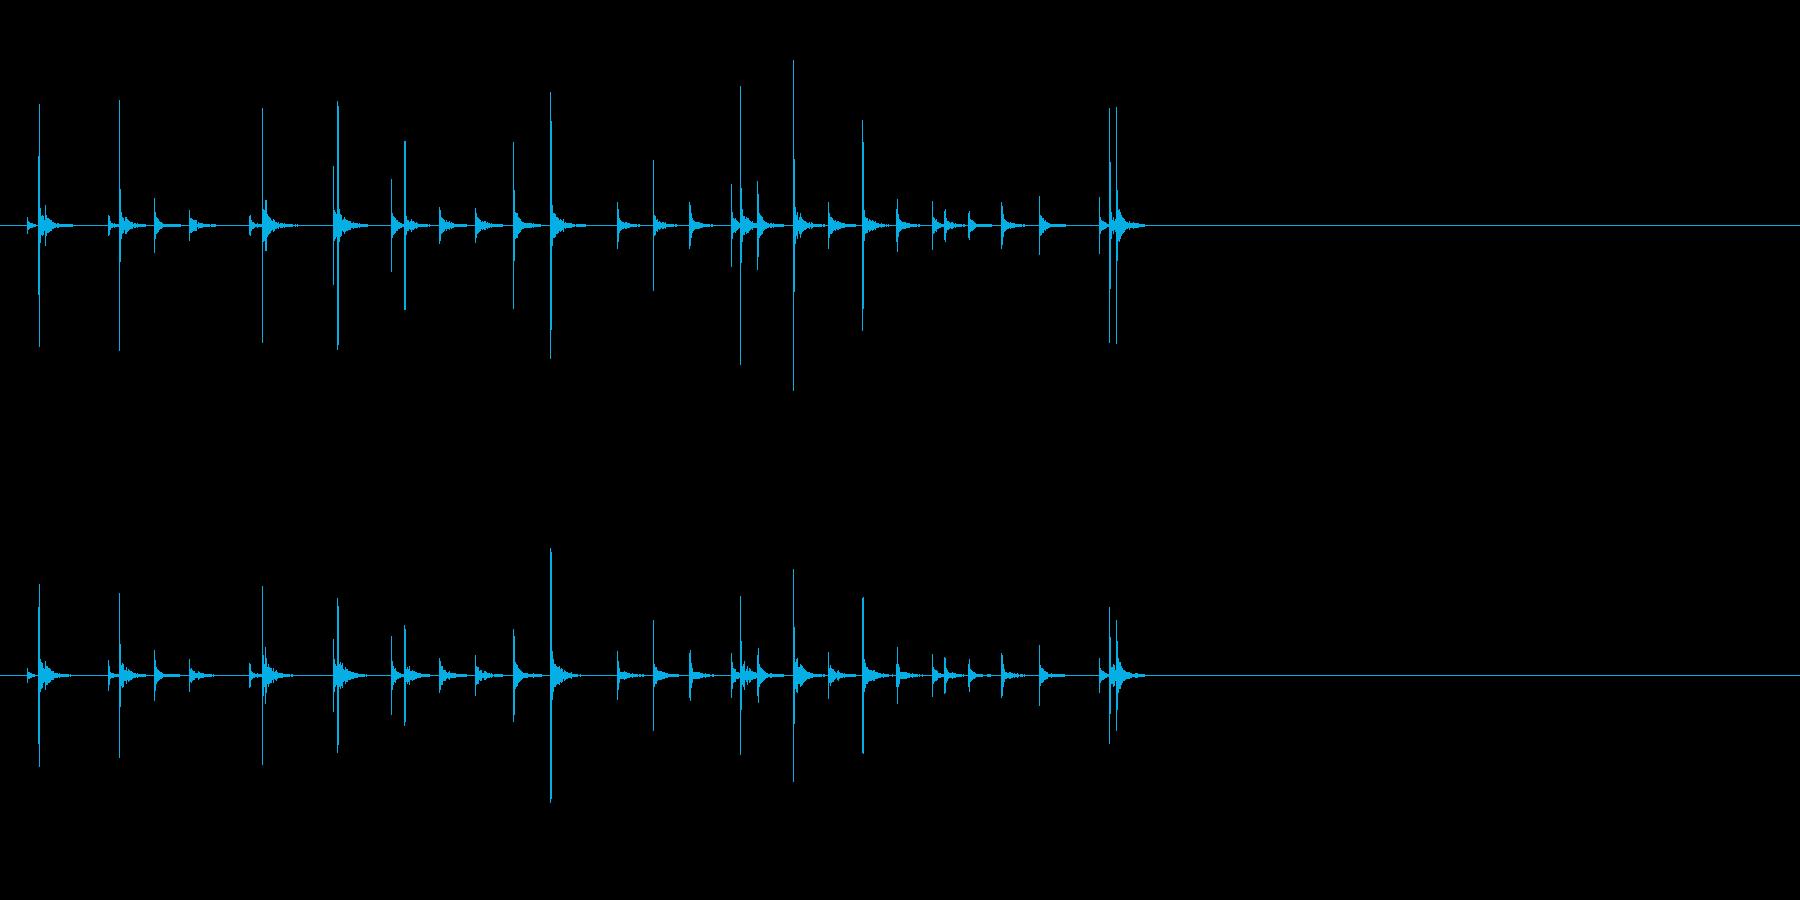 小木魚木章7歌舞伎黒御簾下座音楽和風日本の再生済みの波形